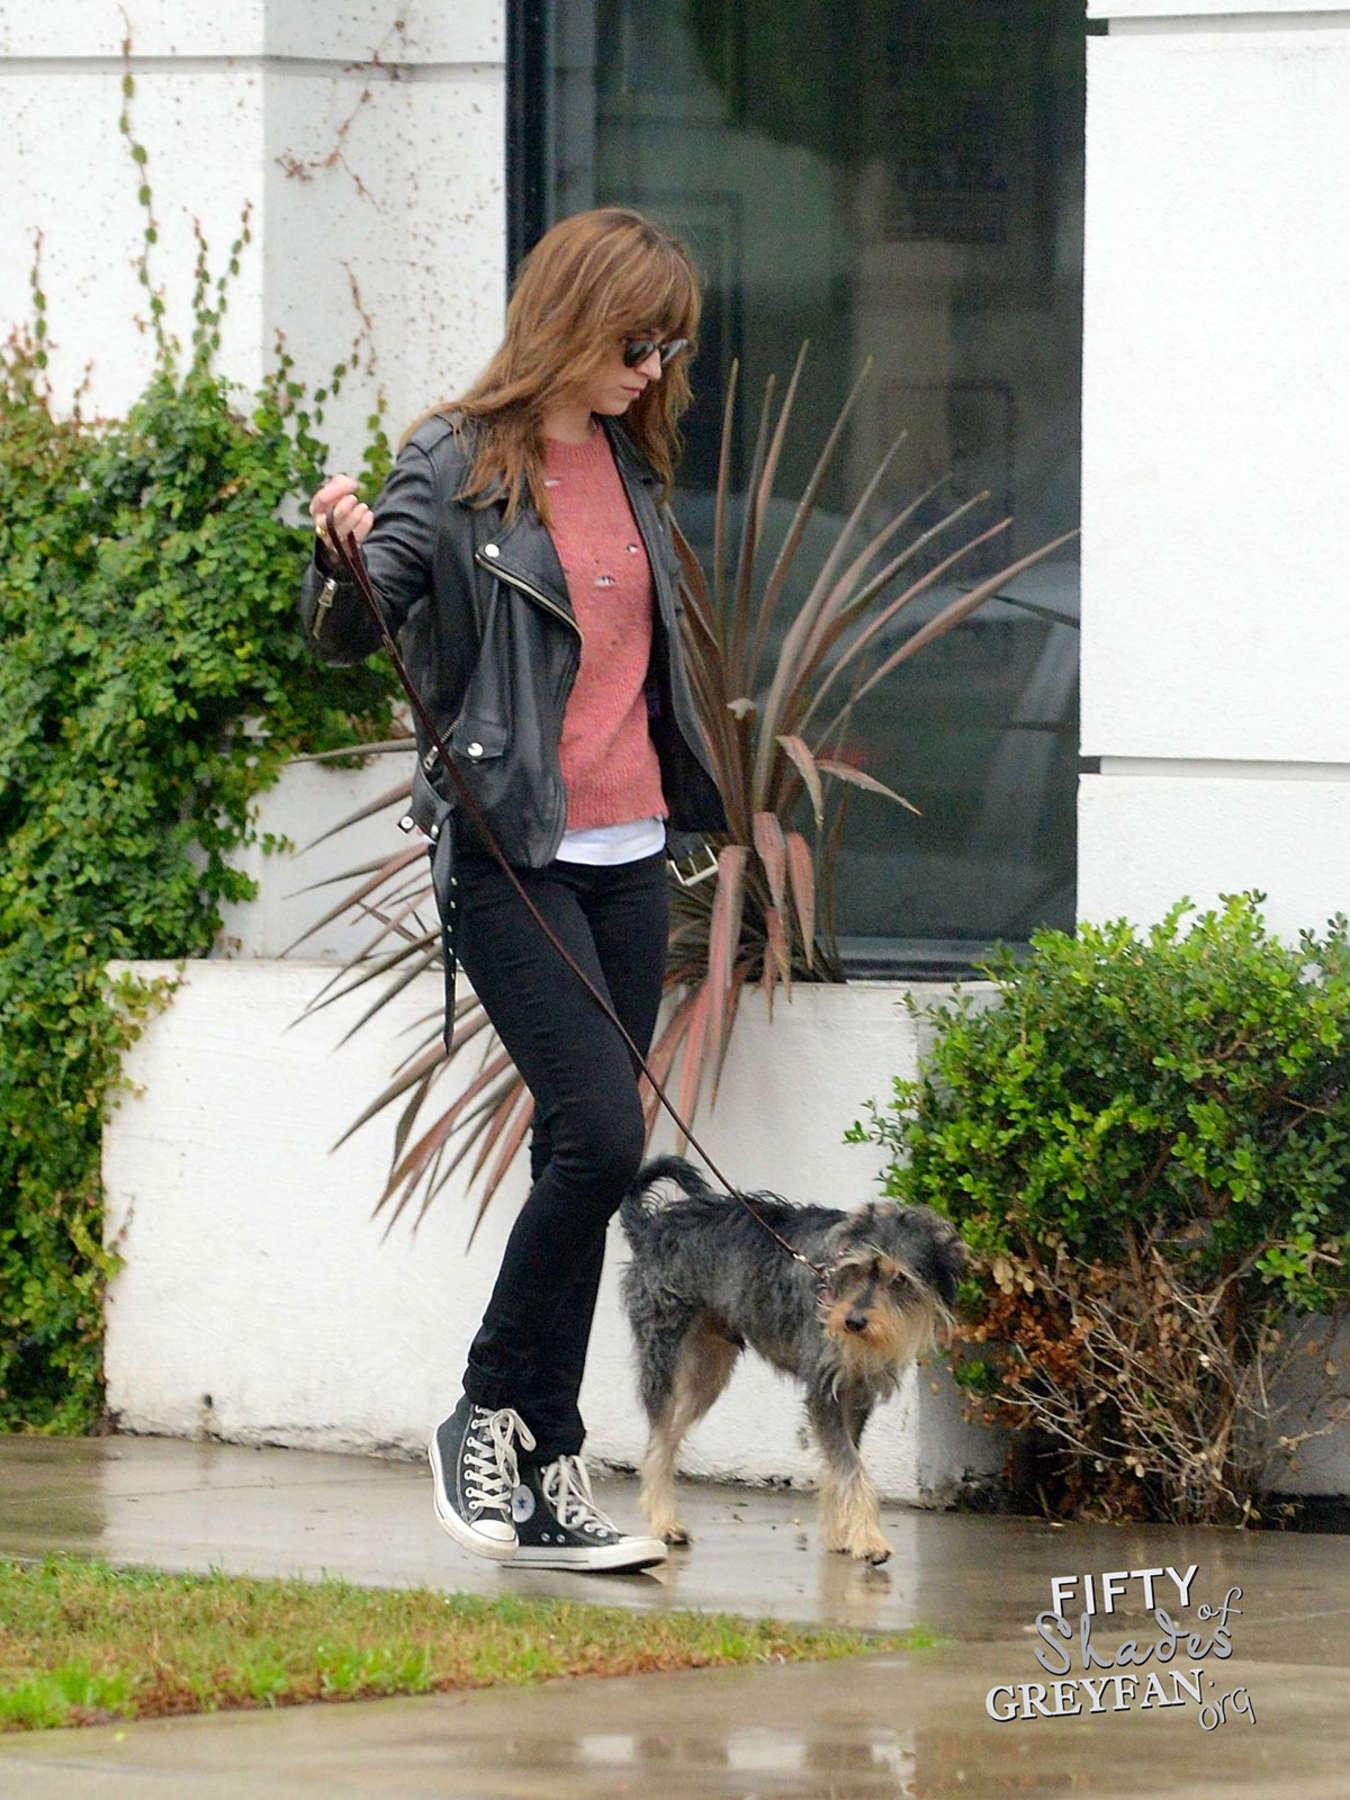 Dakota johnson in black jeans 11 gotceleb for Dog boarding los angeles